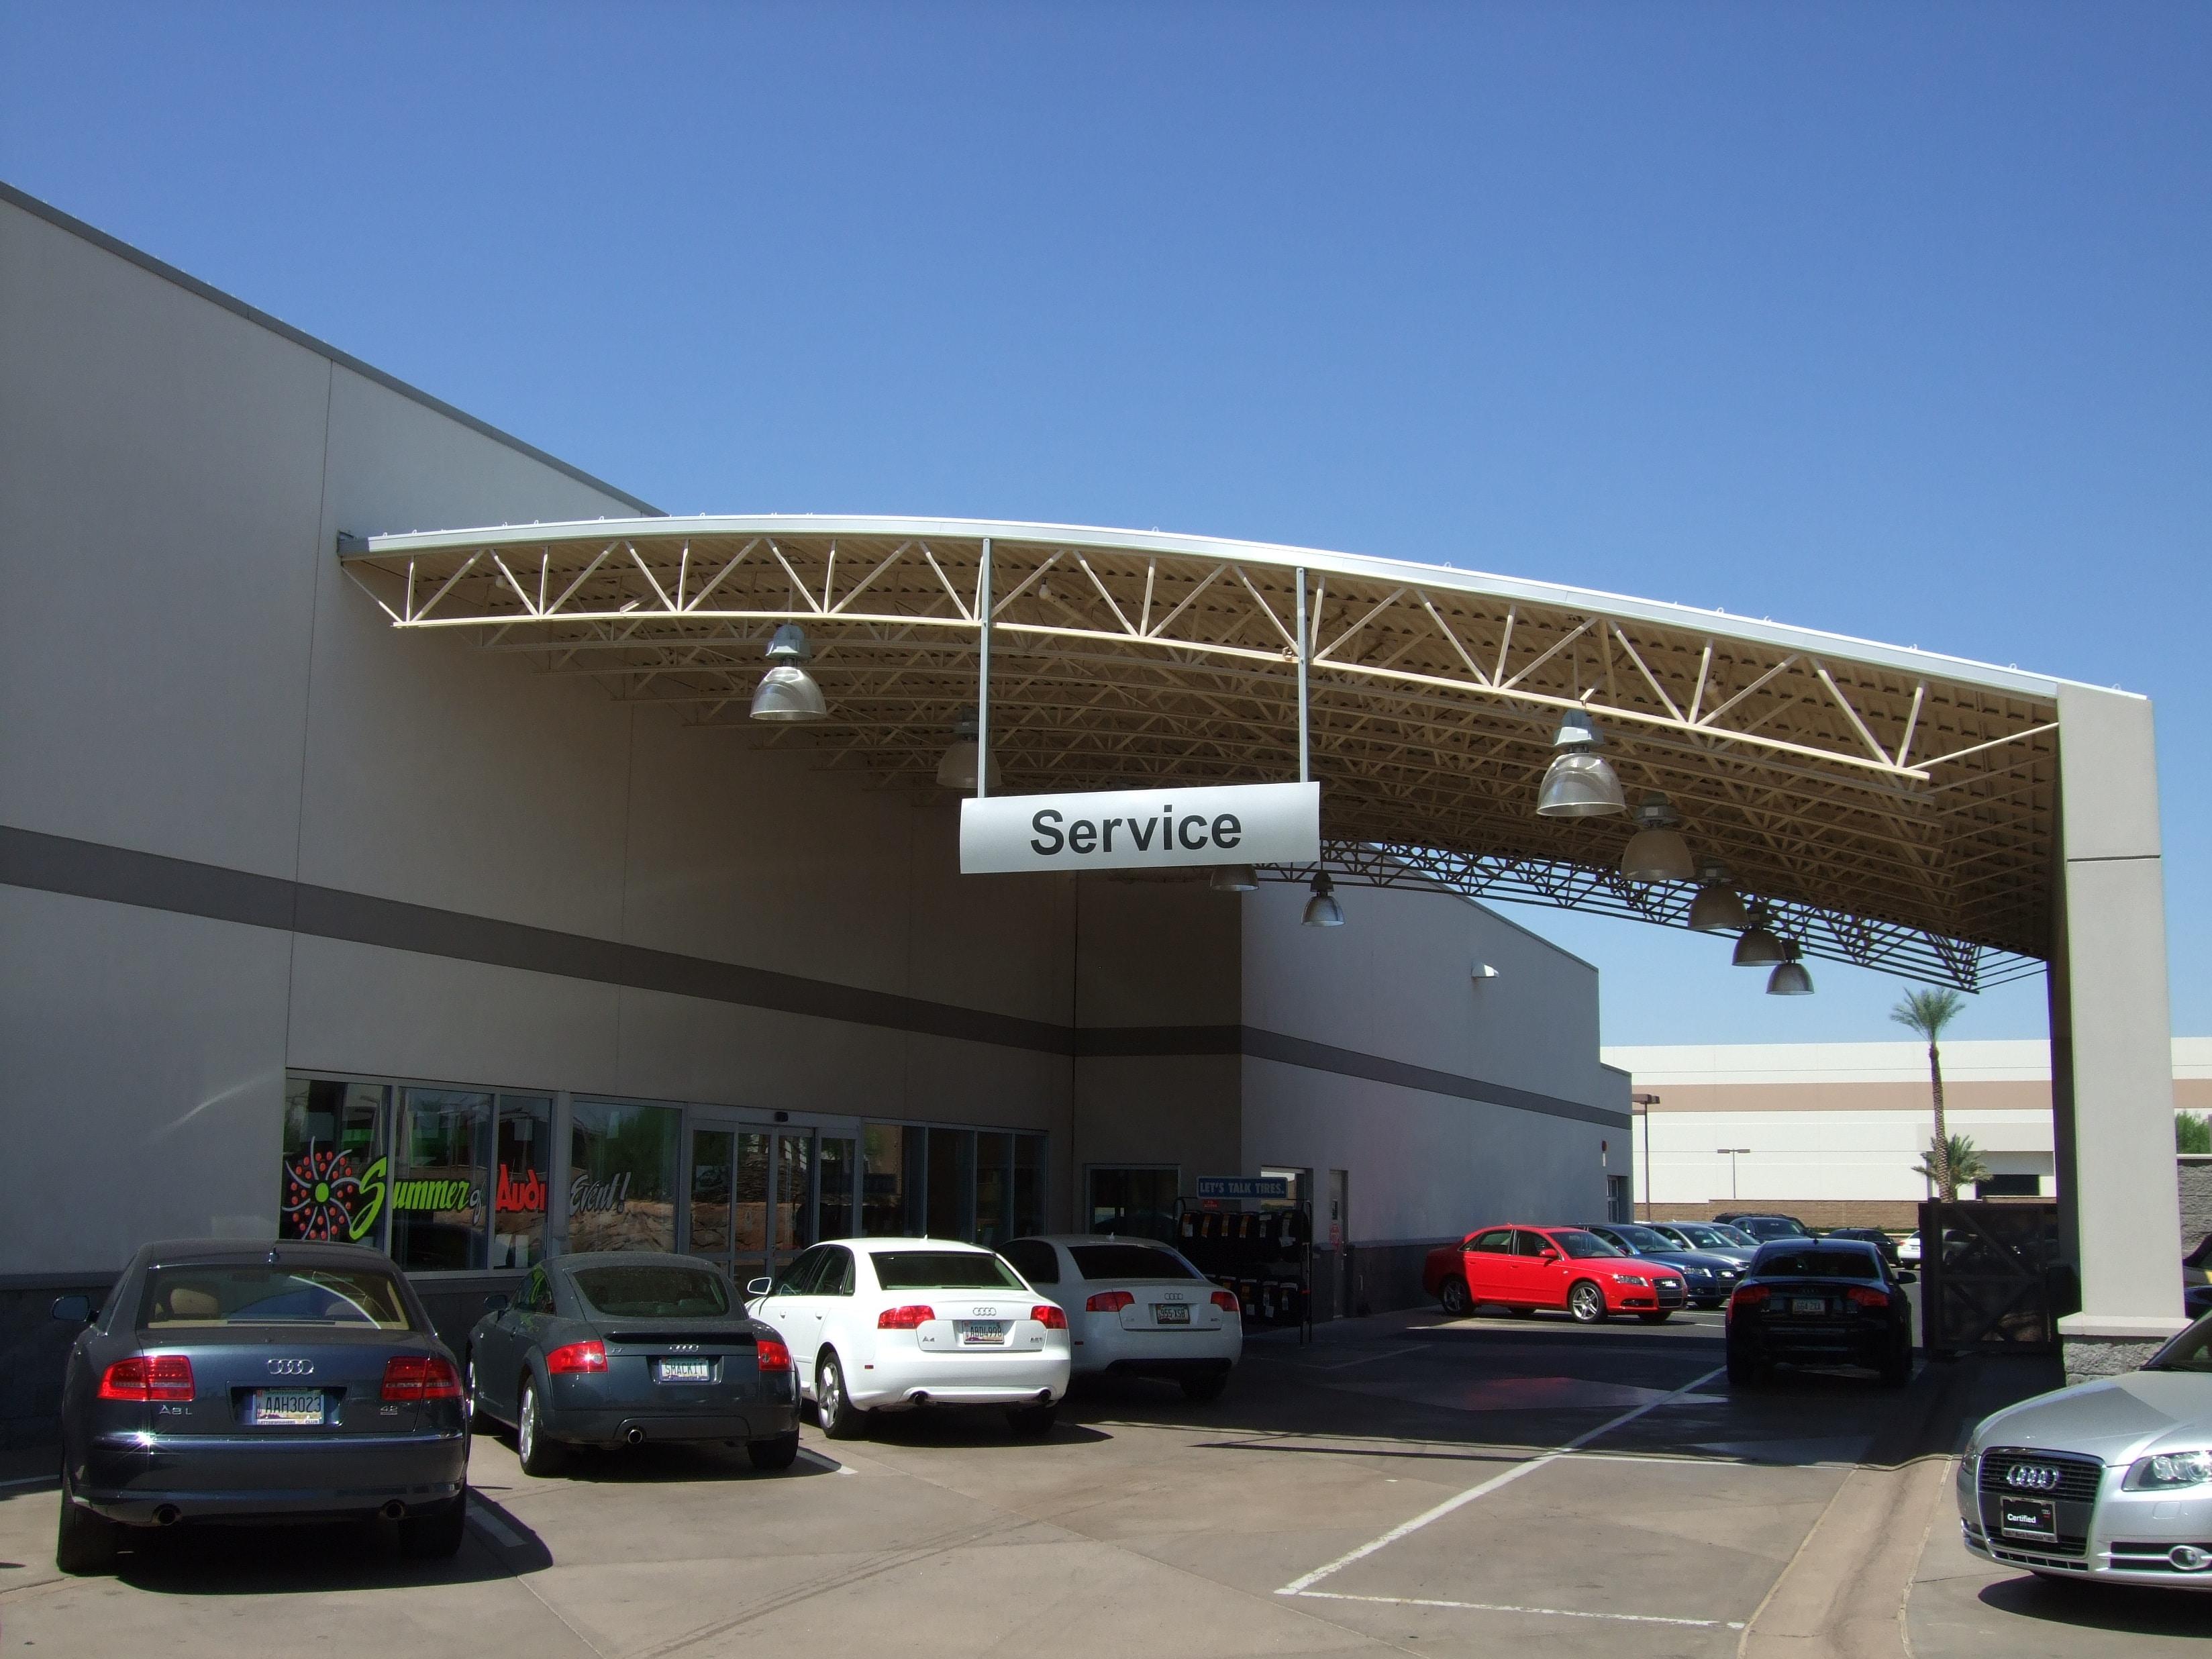 Audi North Scottsdale New Audi Dealership In Phoenix AZ - Audi north scottsdale service